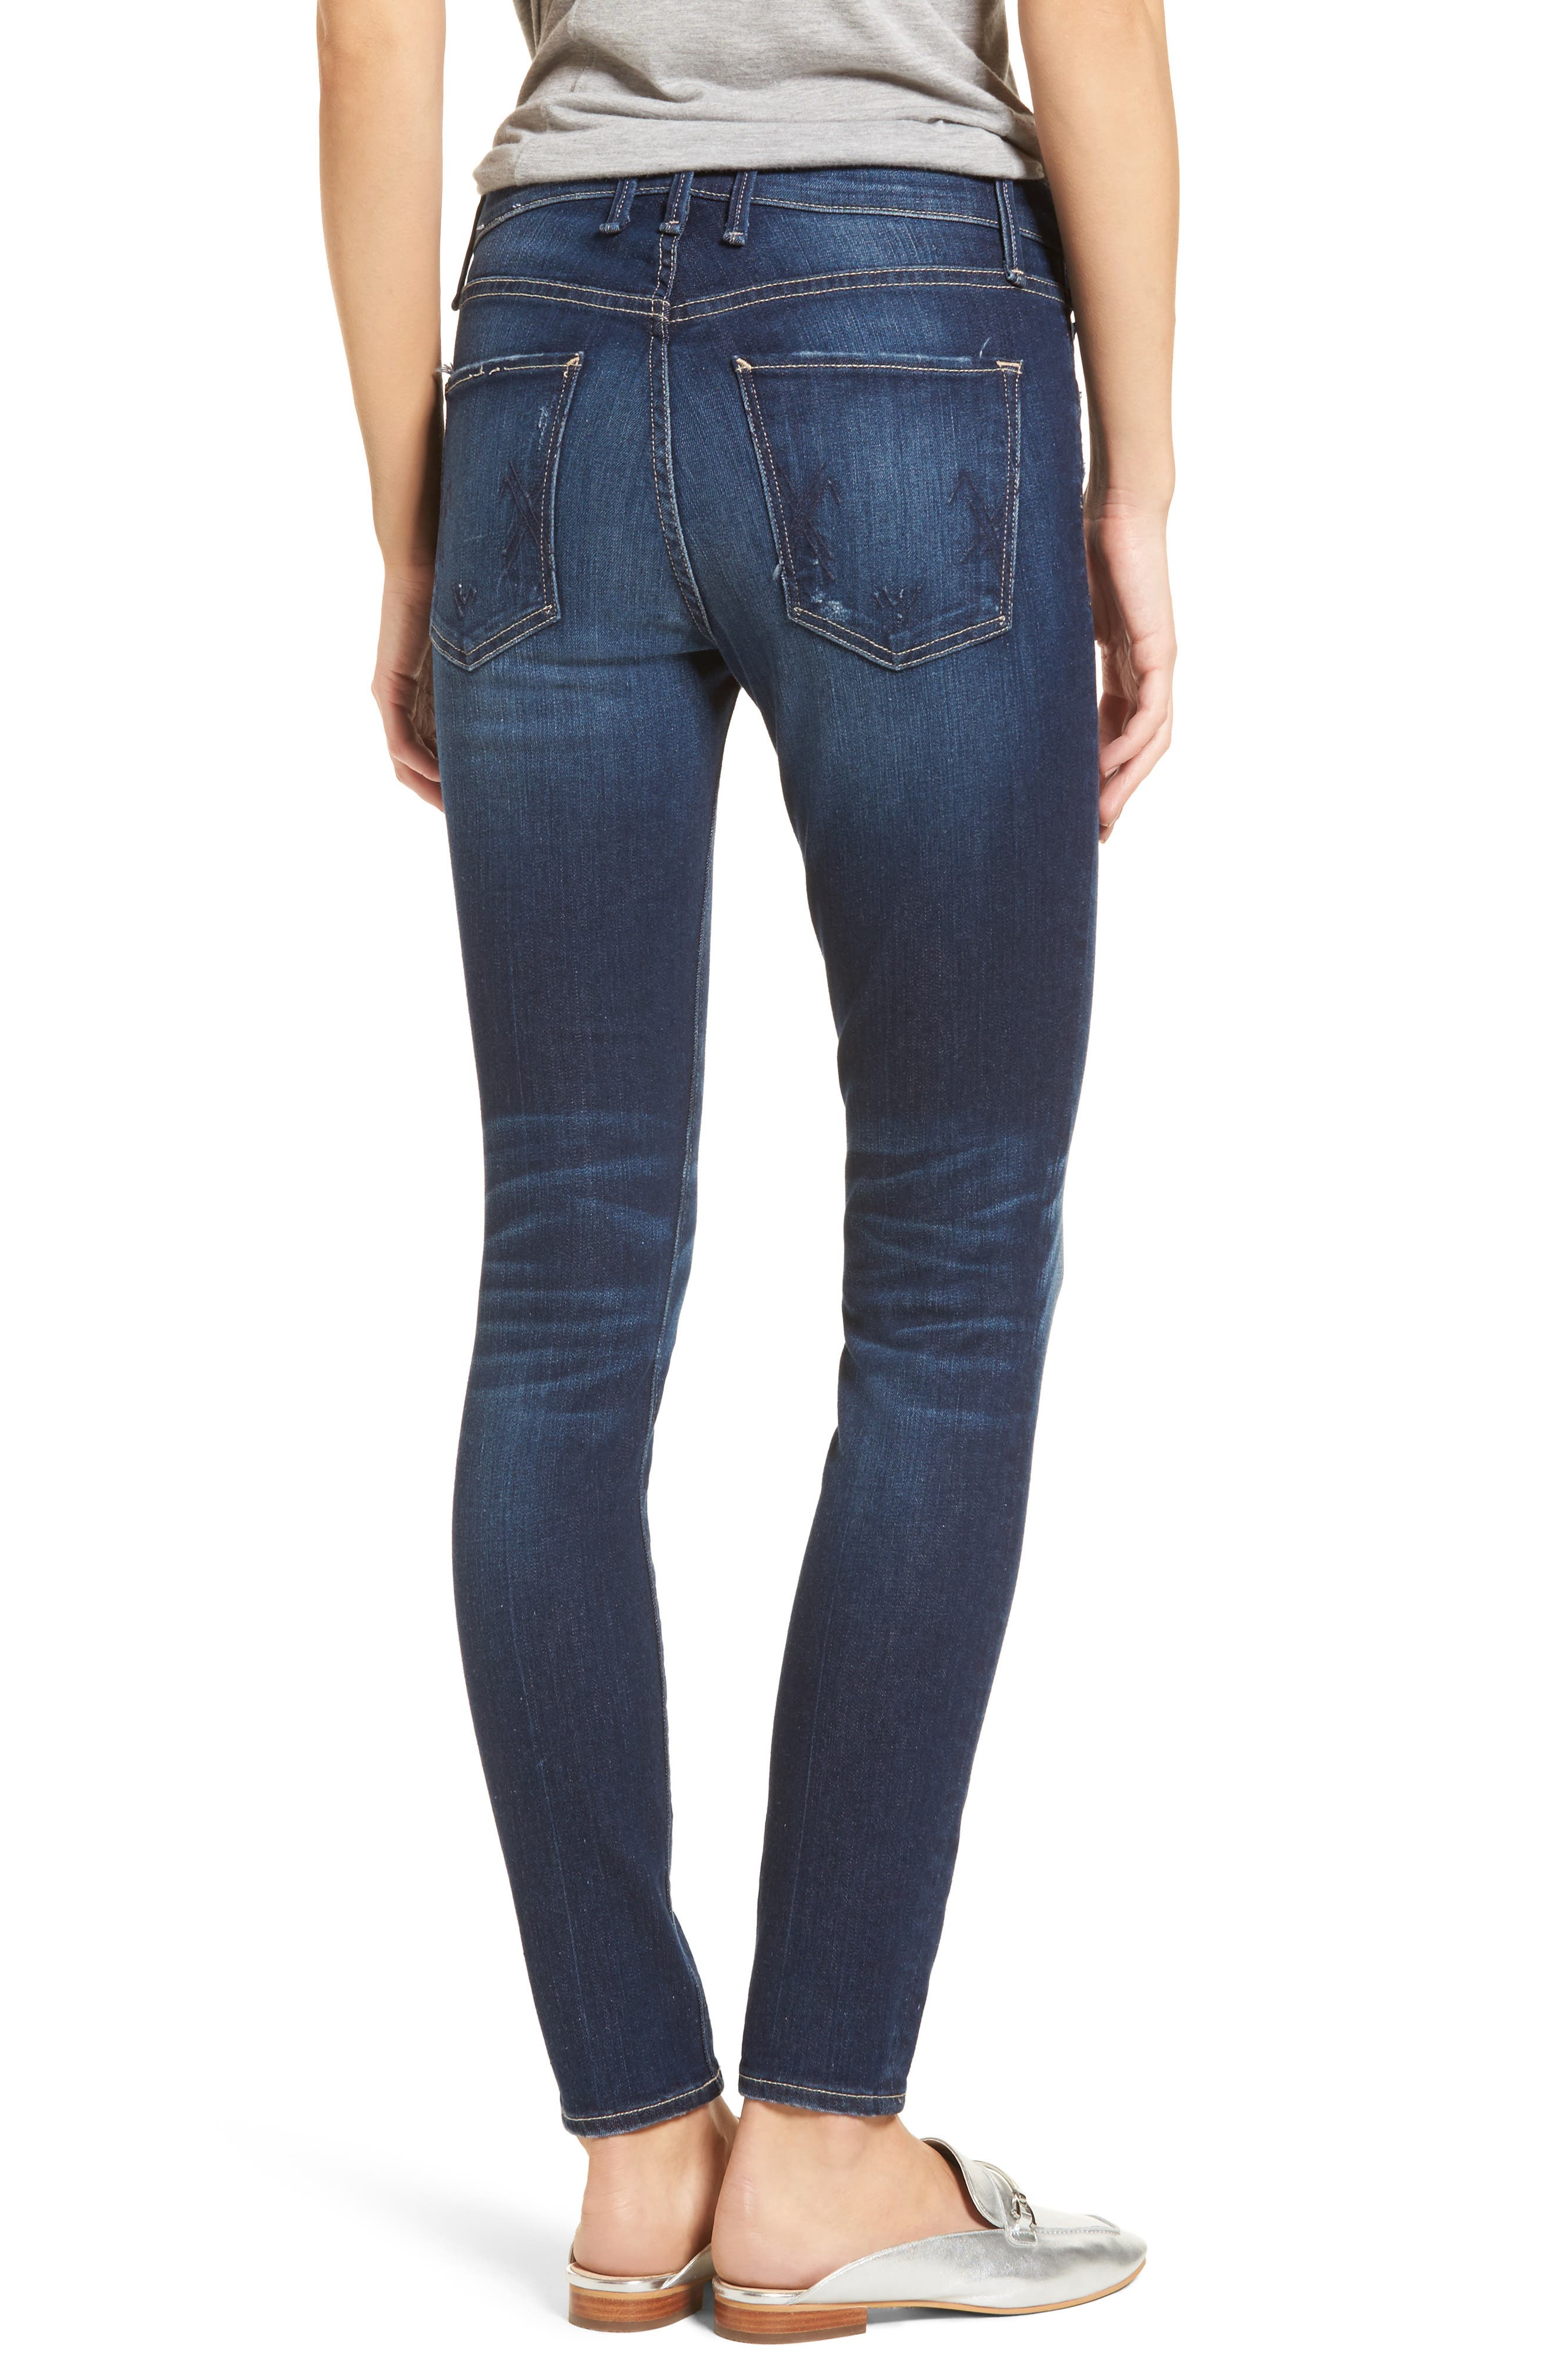 Newton Skinny Jeans,                             Alternate thumbnail 2, color,                             429